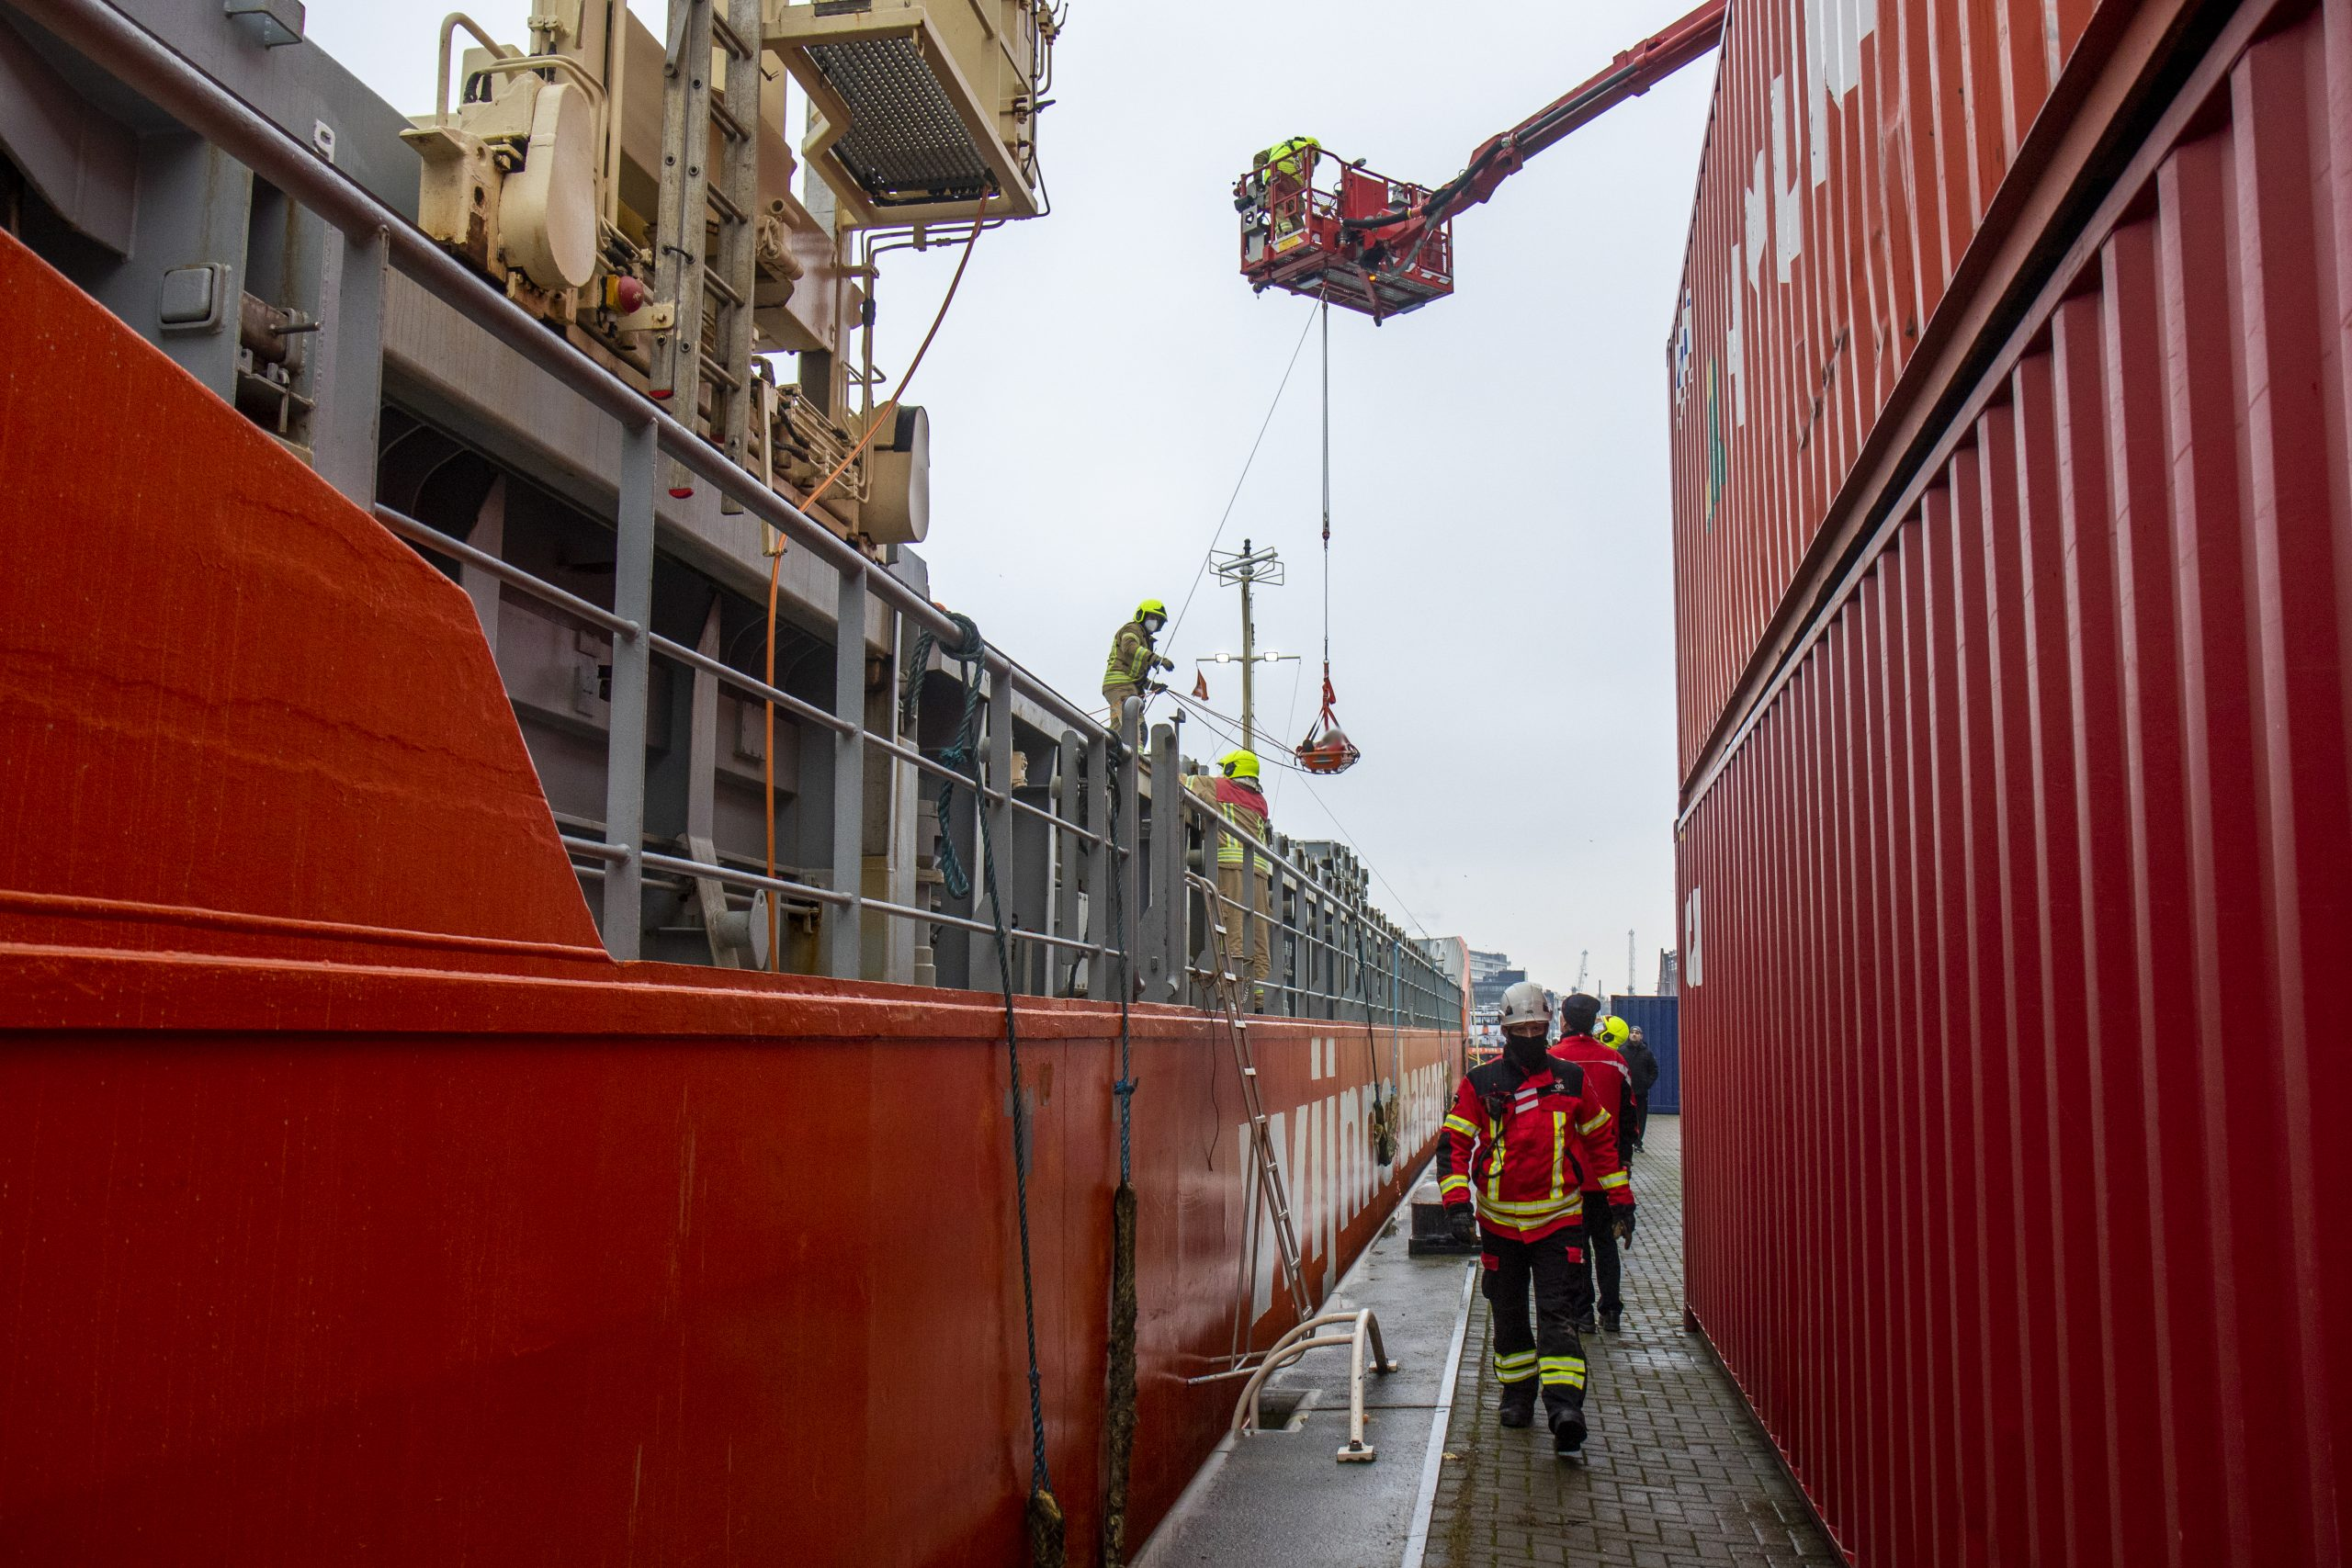 Hoogtereddingsteam brandweer redt man uit ruim van schip. Foto: Ginopress